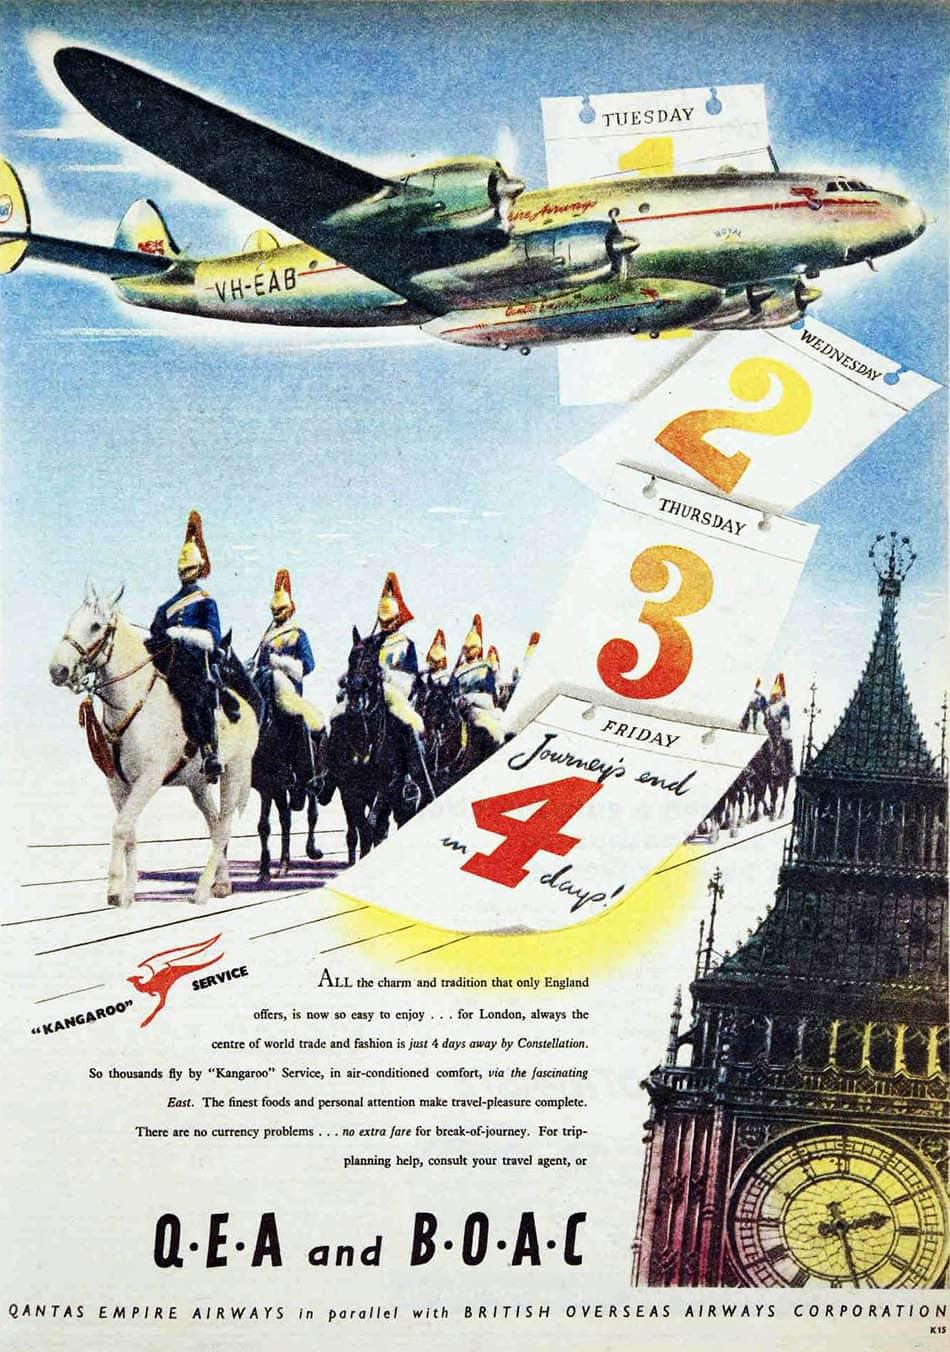 Qantas Empire Airways and British Overseas Airways Corporation Advertisement 1949